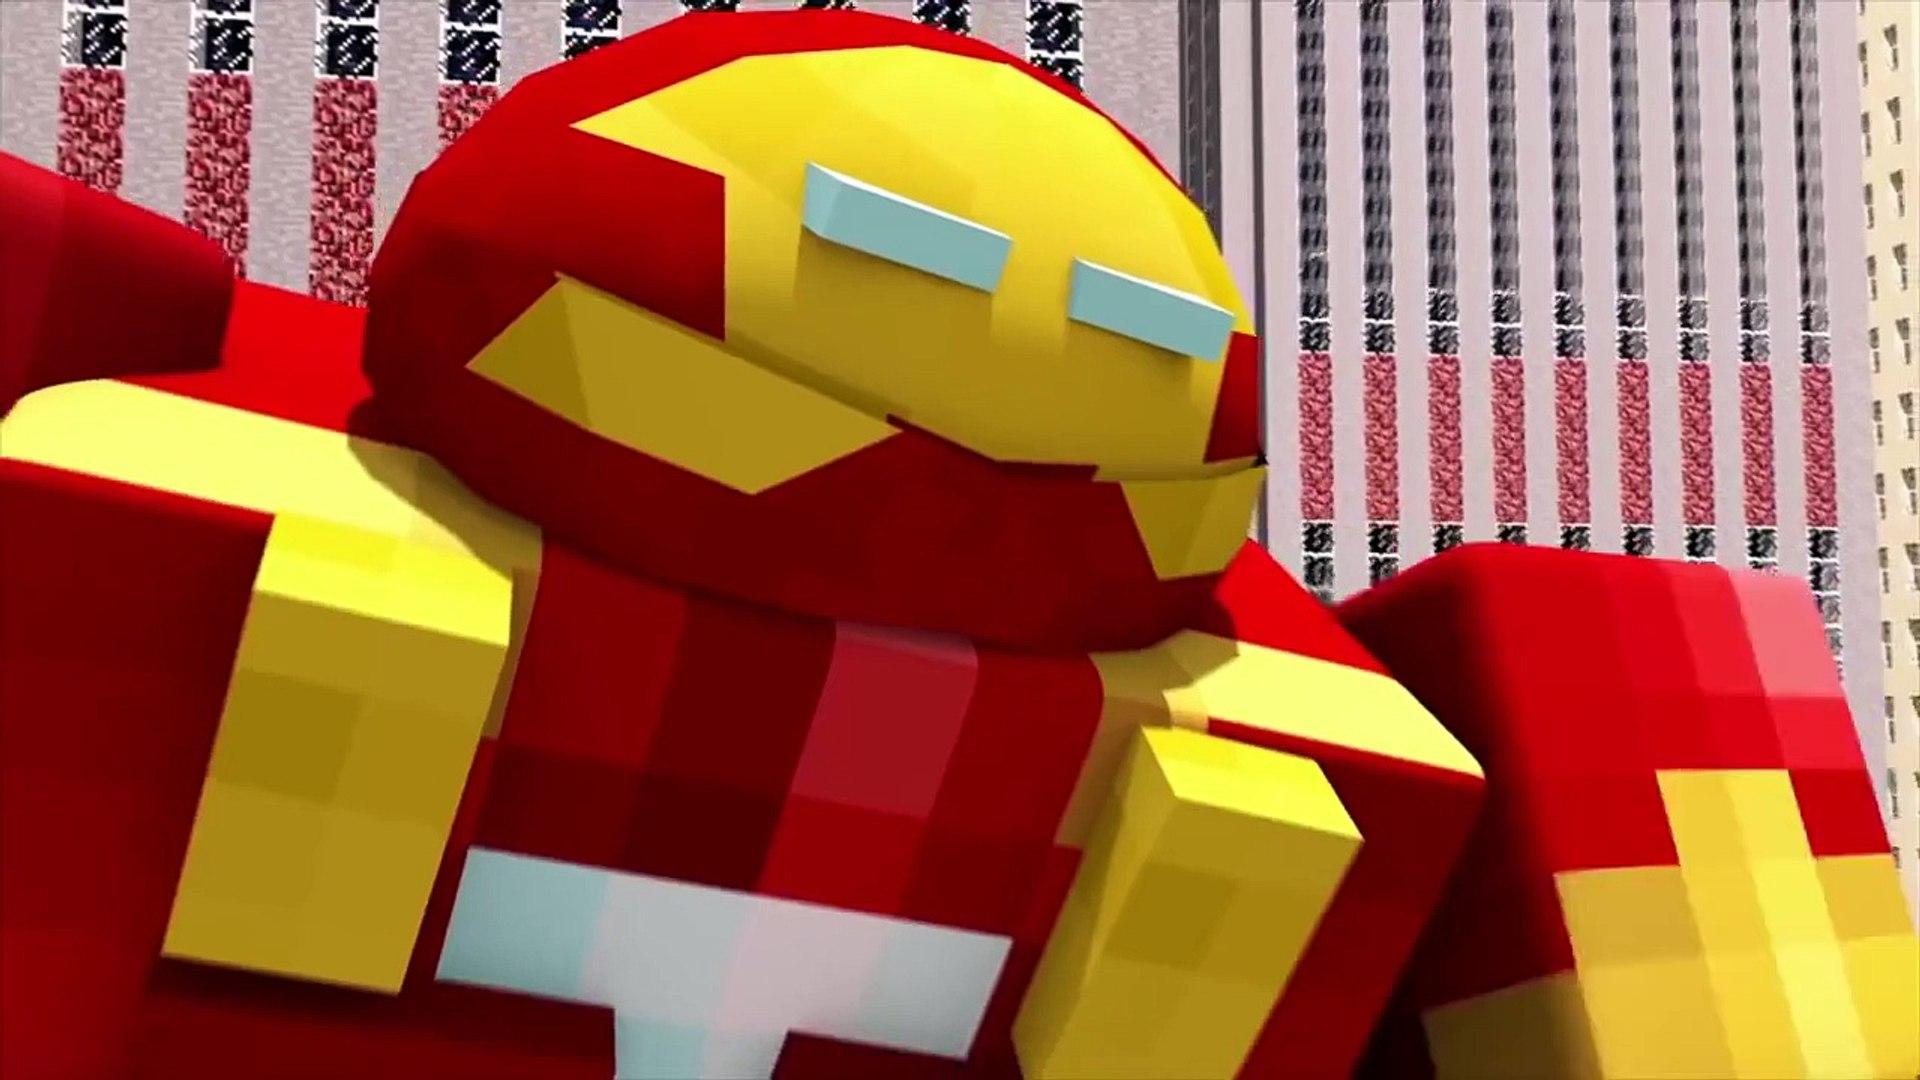 Tomorrowland - HISHE Features: Minute Minecraft Parodies